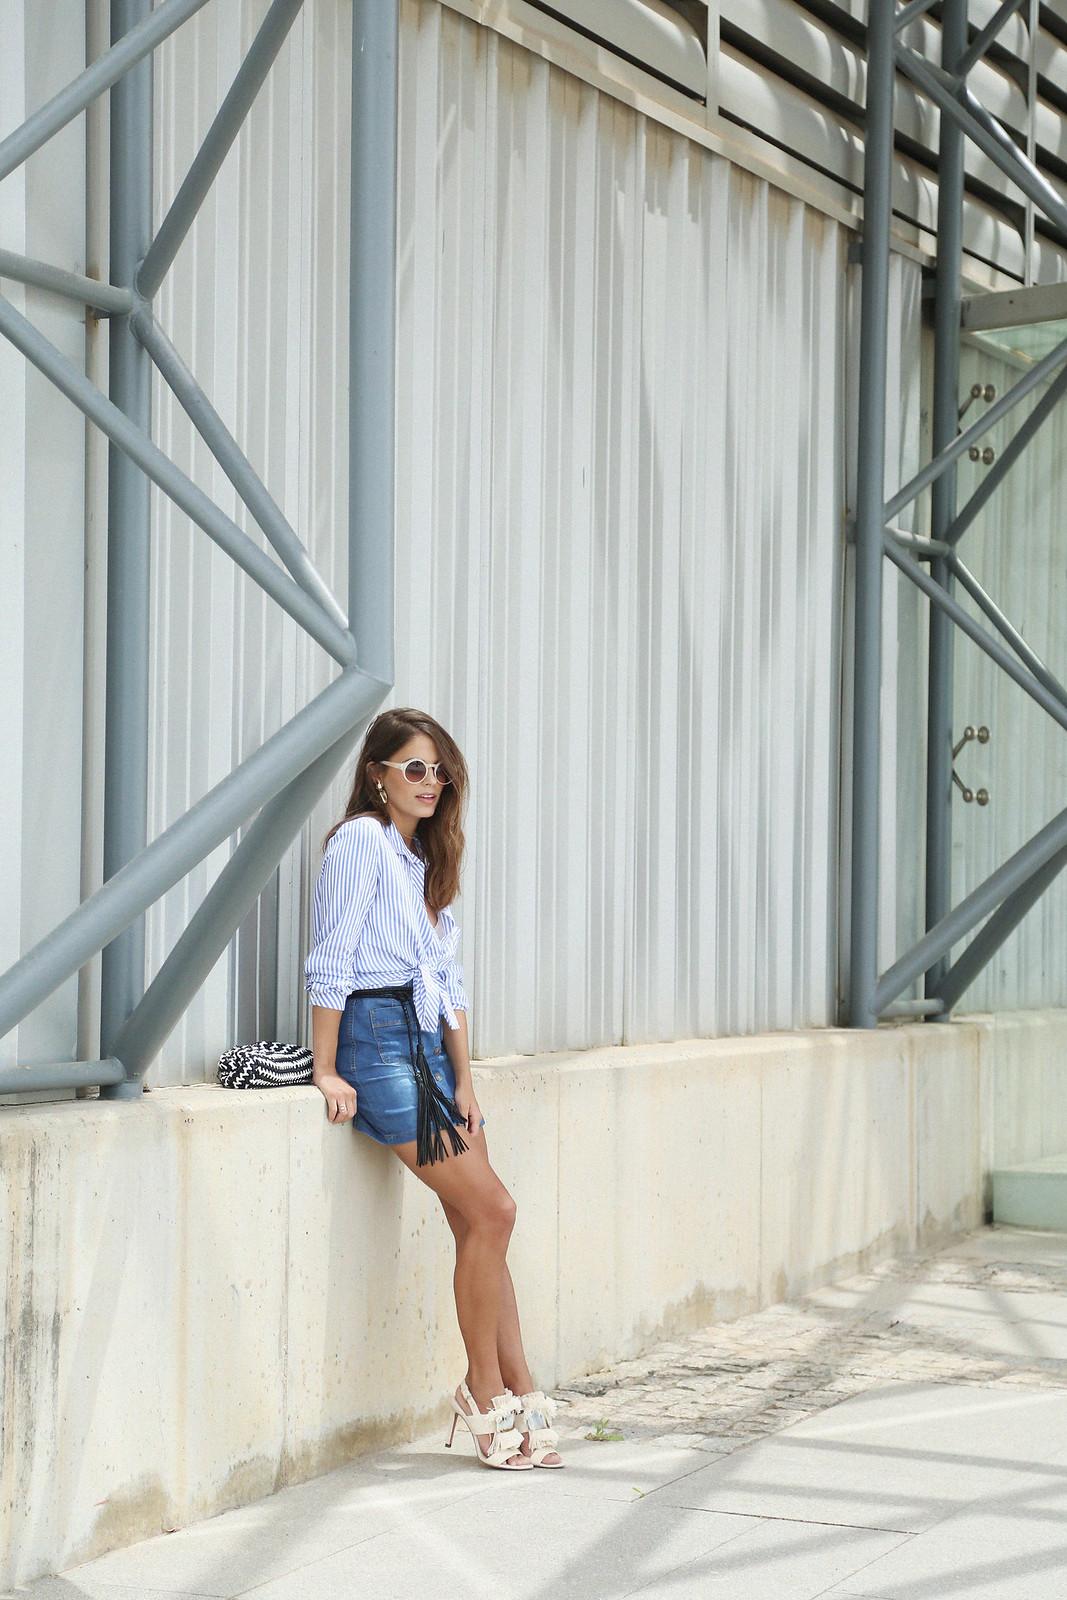 jessie chanes seams for a desire denim skirt stripes shirt-8